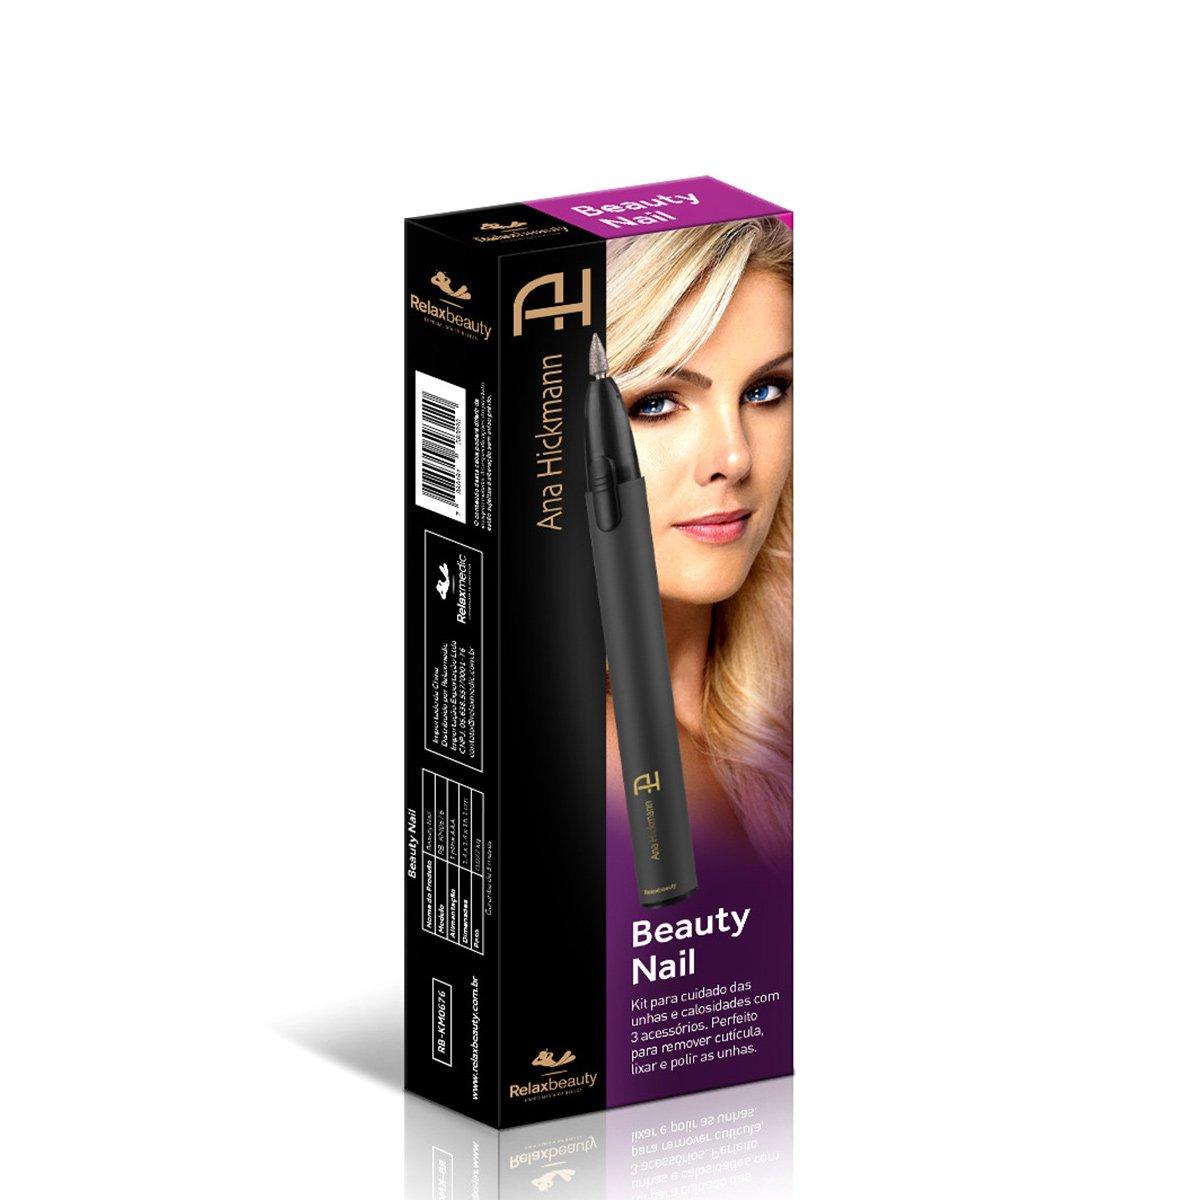 Kit de Unhas Relaxbeauty Ana Hickmann Beauty Nail - Preto - Compre ... fa7cc8d9b5